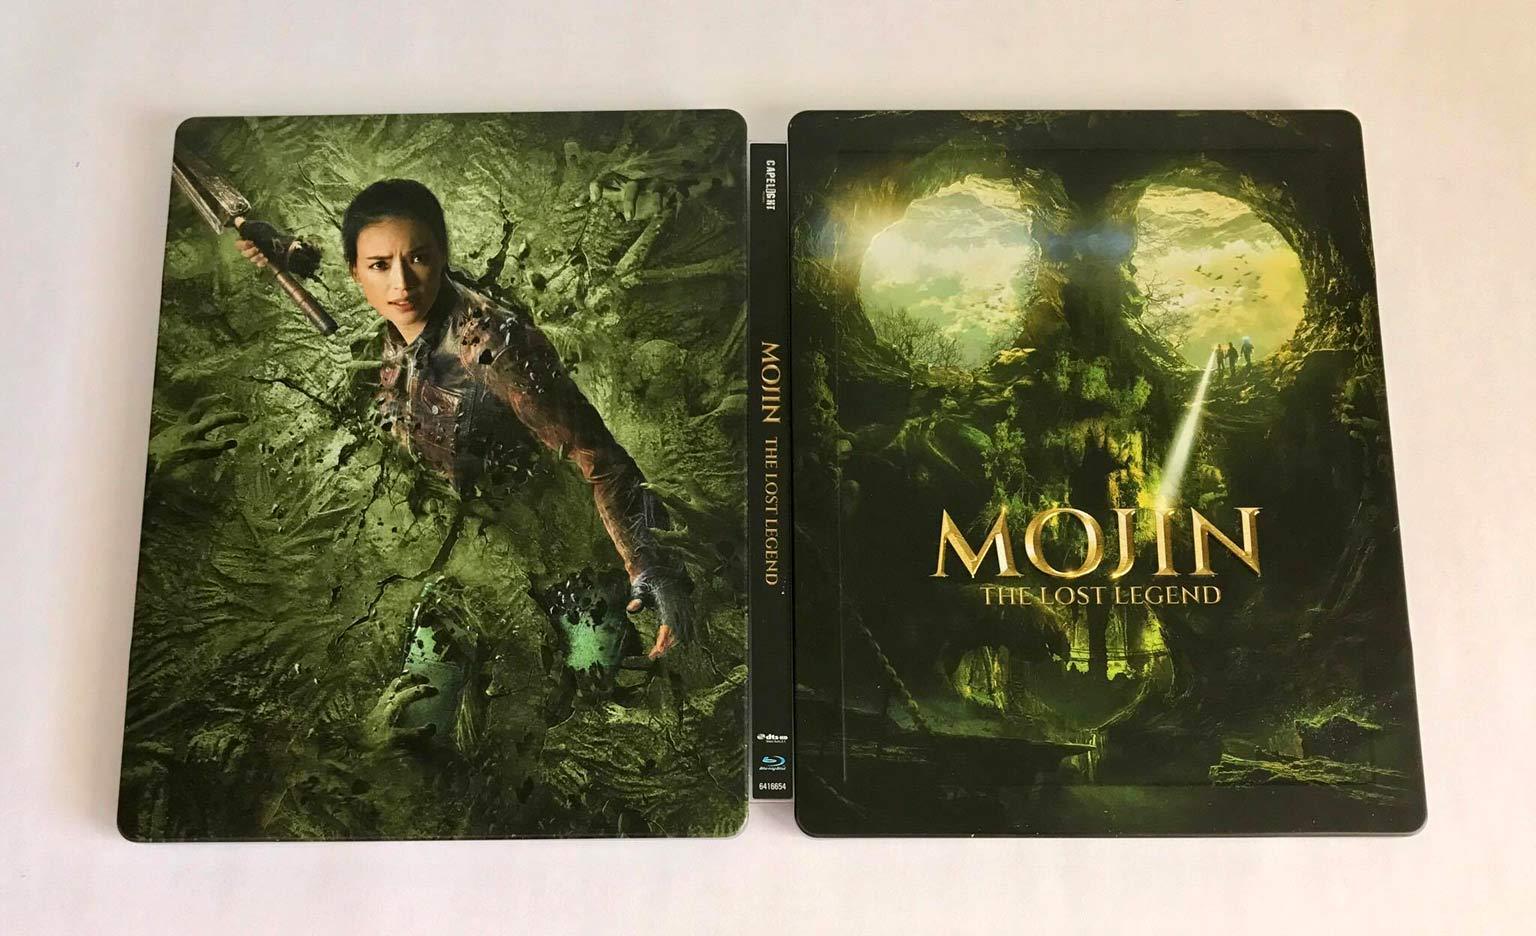 Mojin-steelbook-9